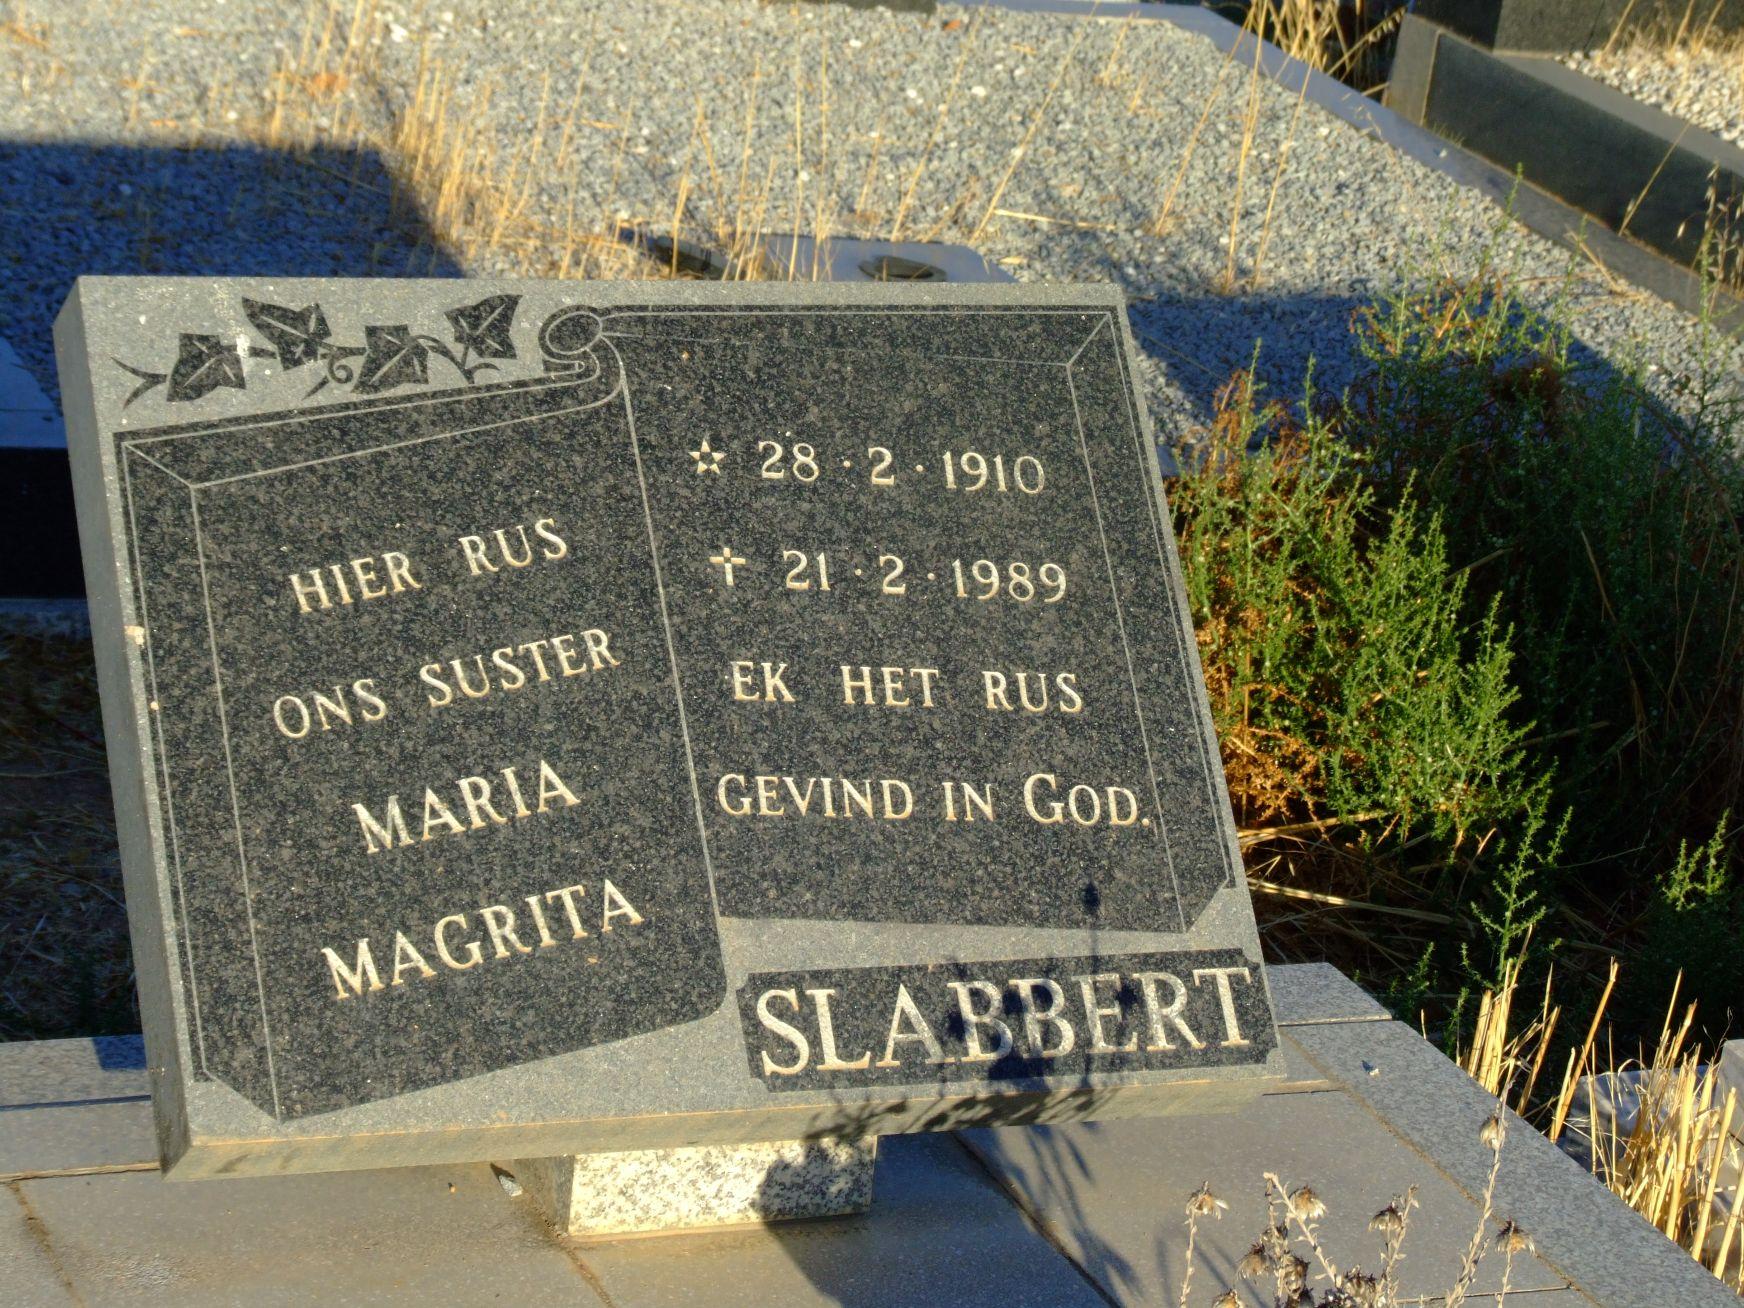 Slabbert Maria Magrita